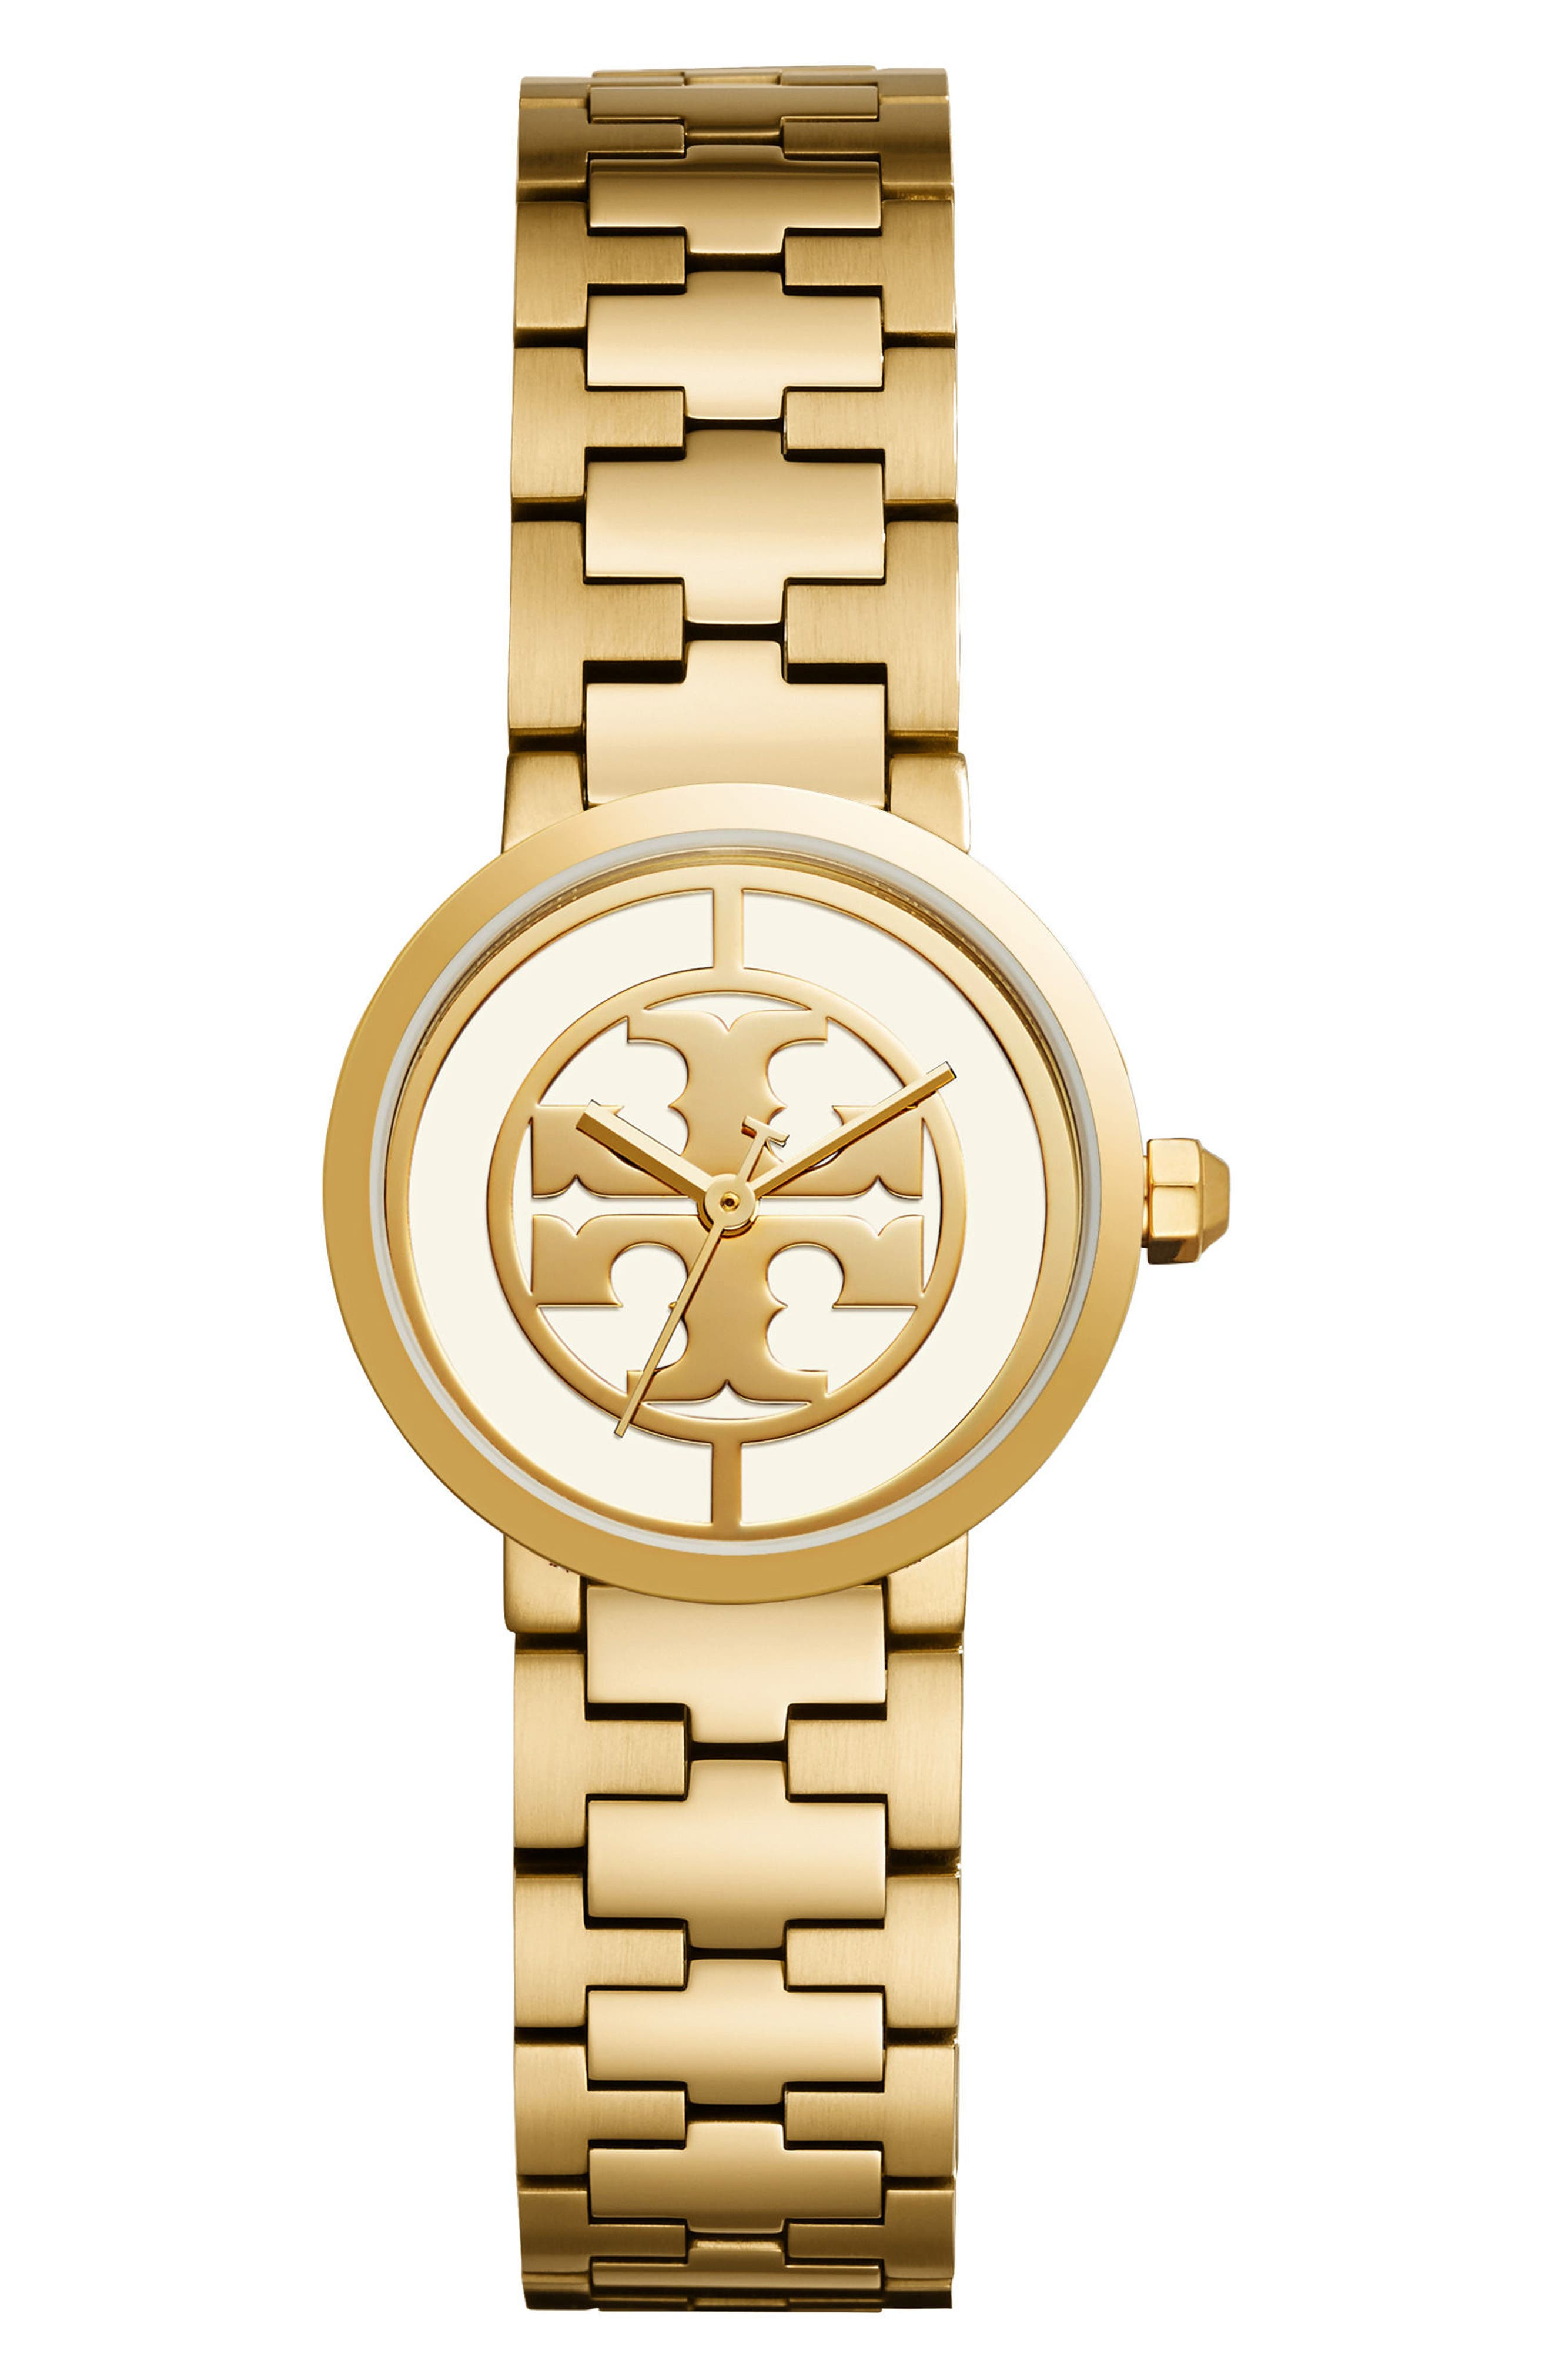 TORY BURCH, Reva Logo Dial Bracelet Watch, 28mm, Main thumbnail 1, color, GOLD/ IVORY/ GOLD